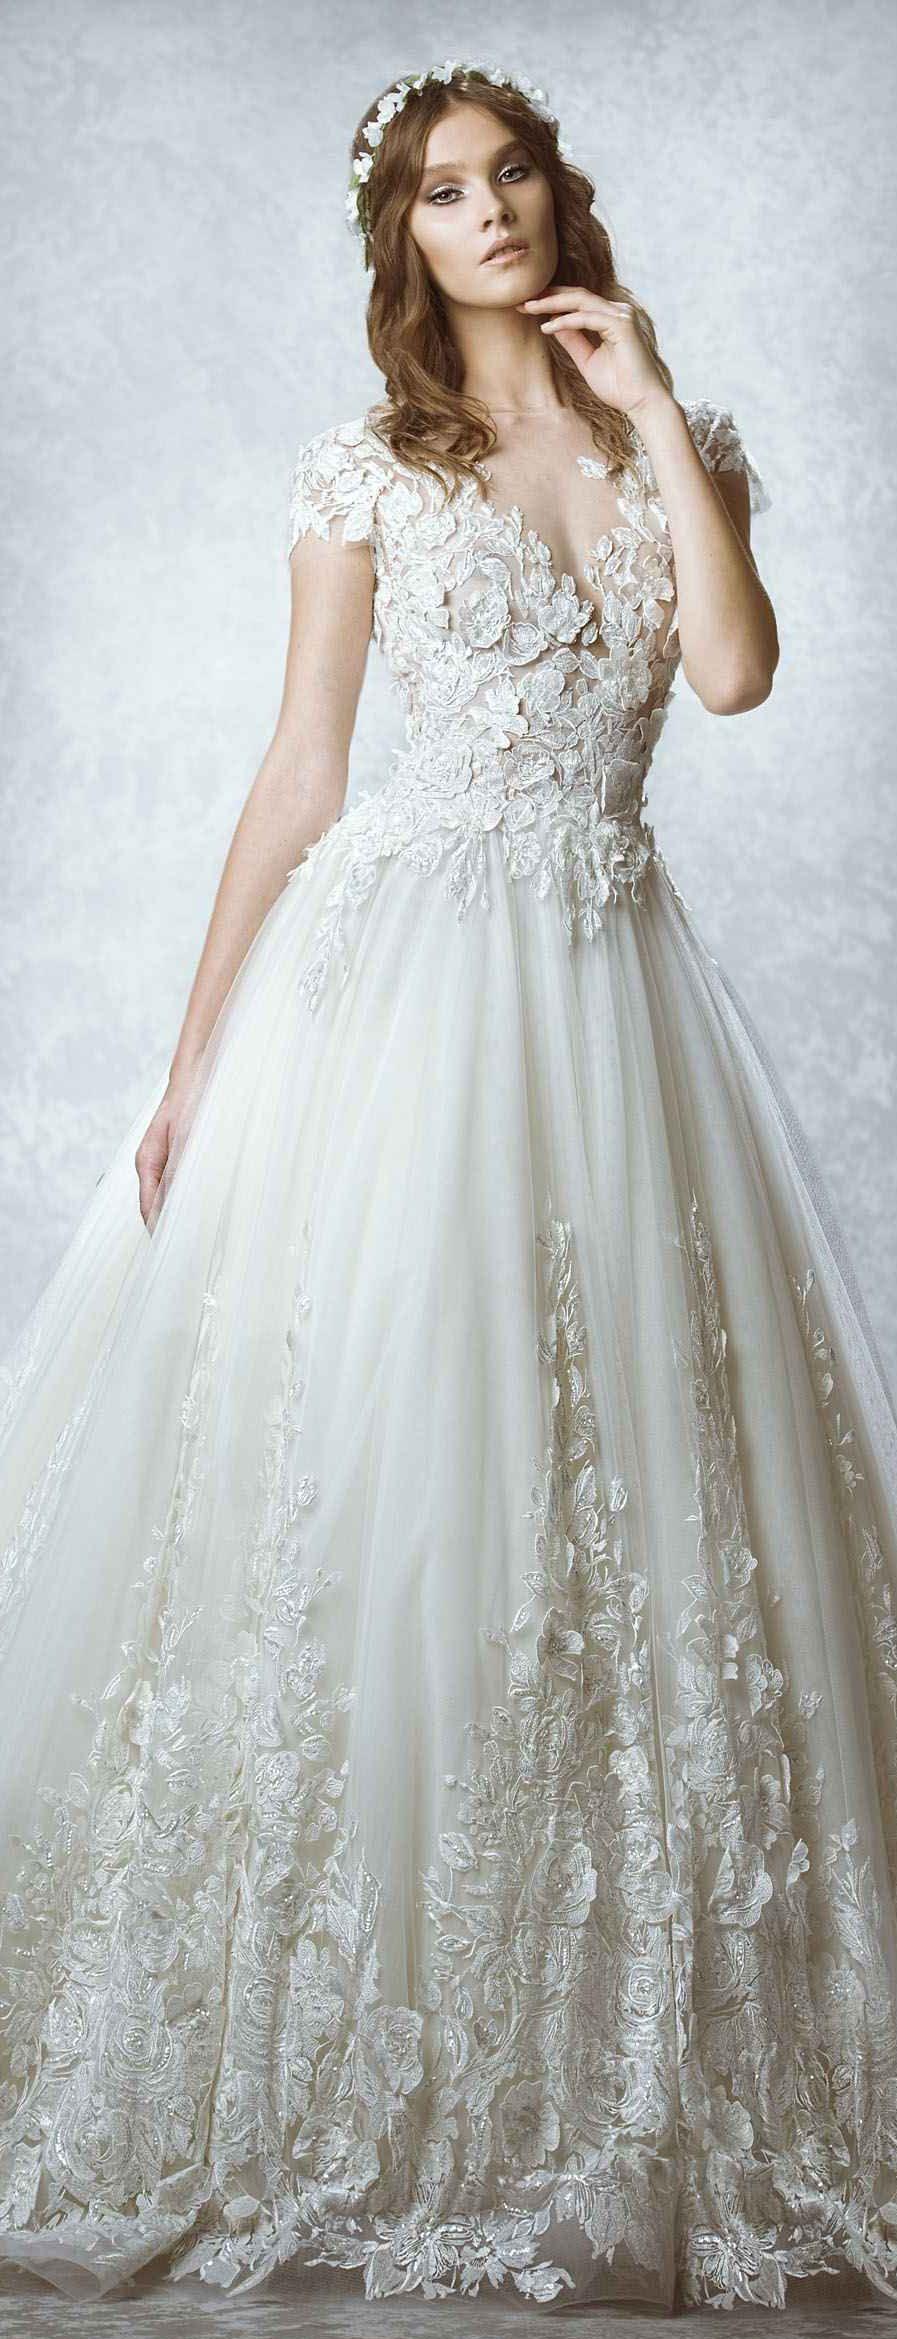 Zahair murad wedding dress novias encajes pinterest